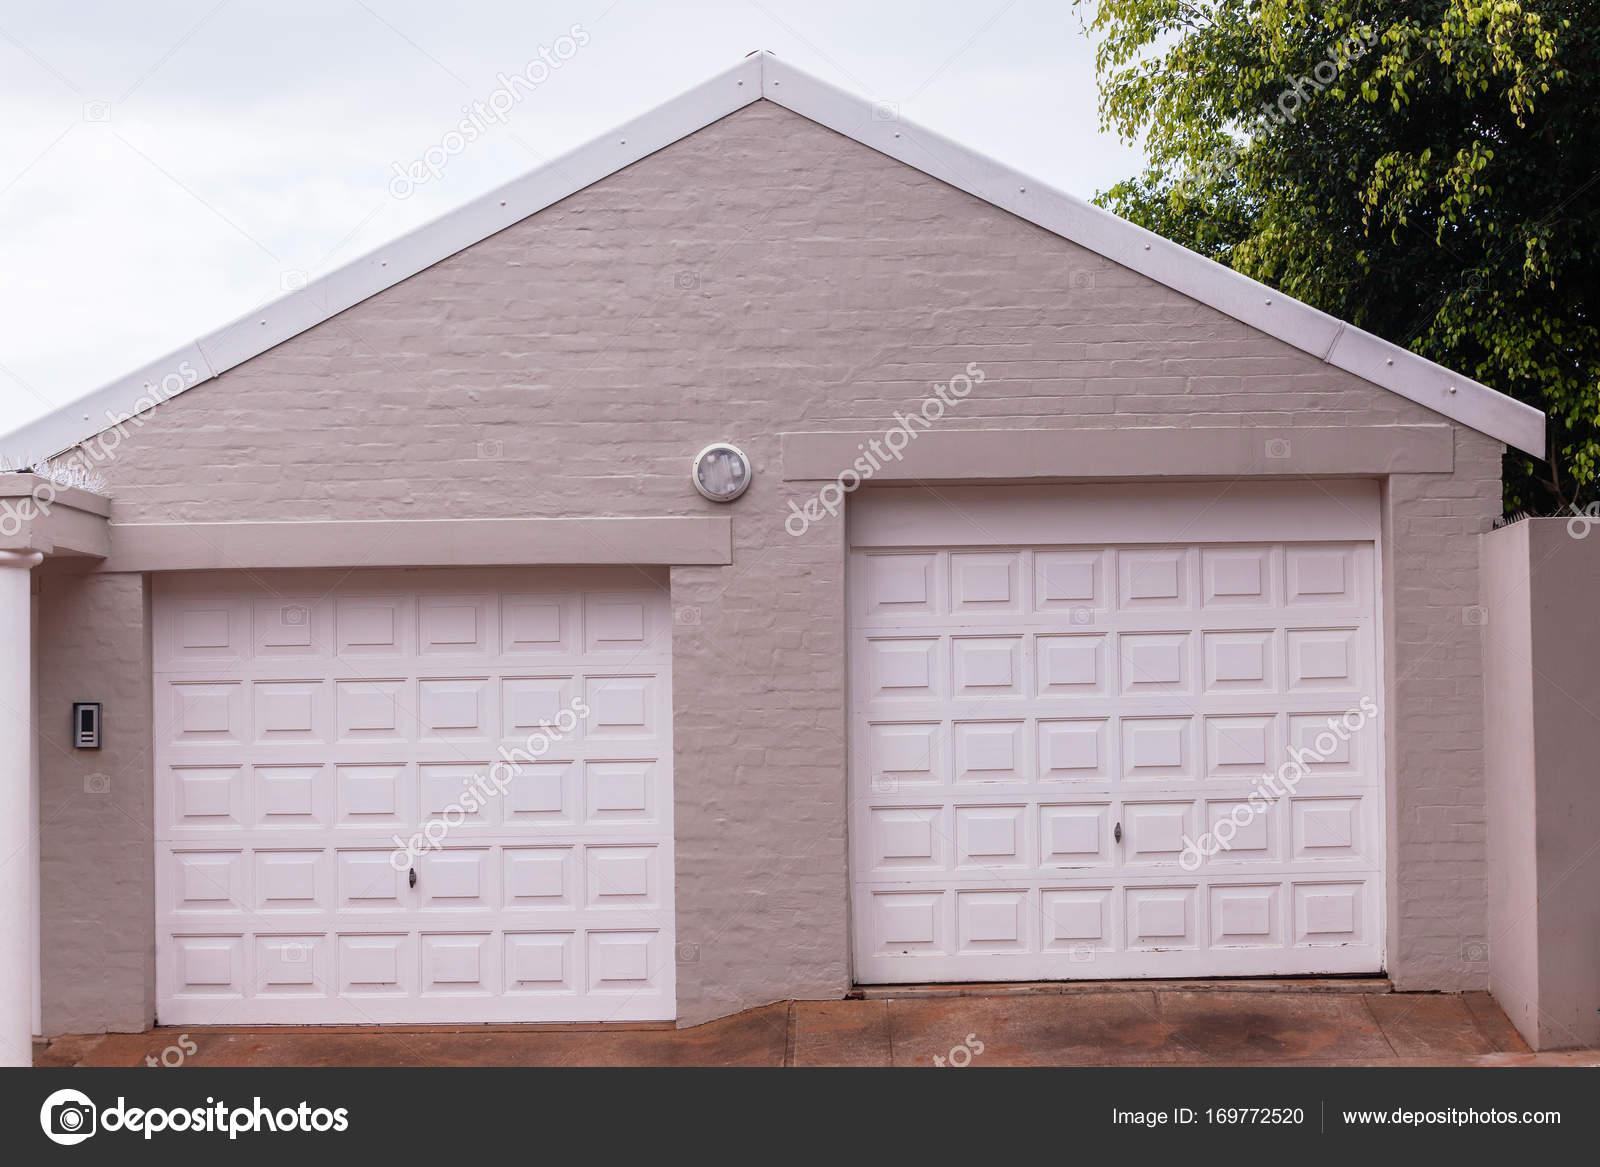 Double garage portes entr e photographie for Telecharger gad garage